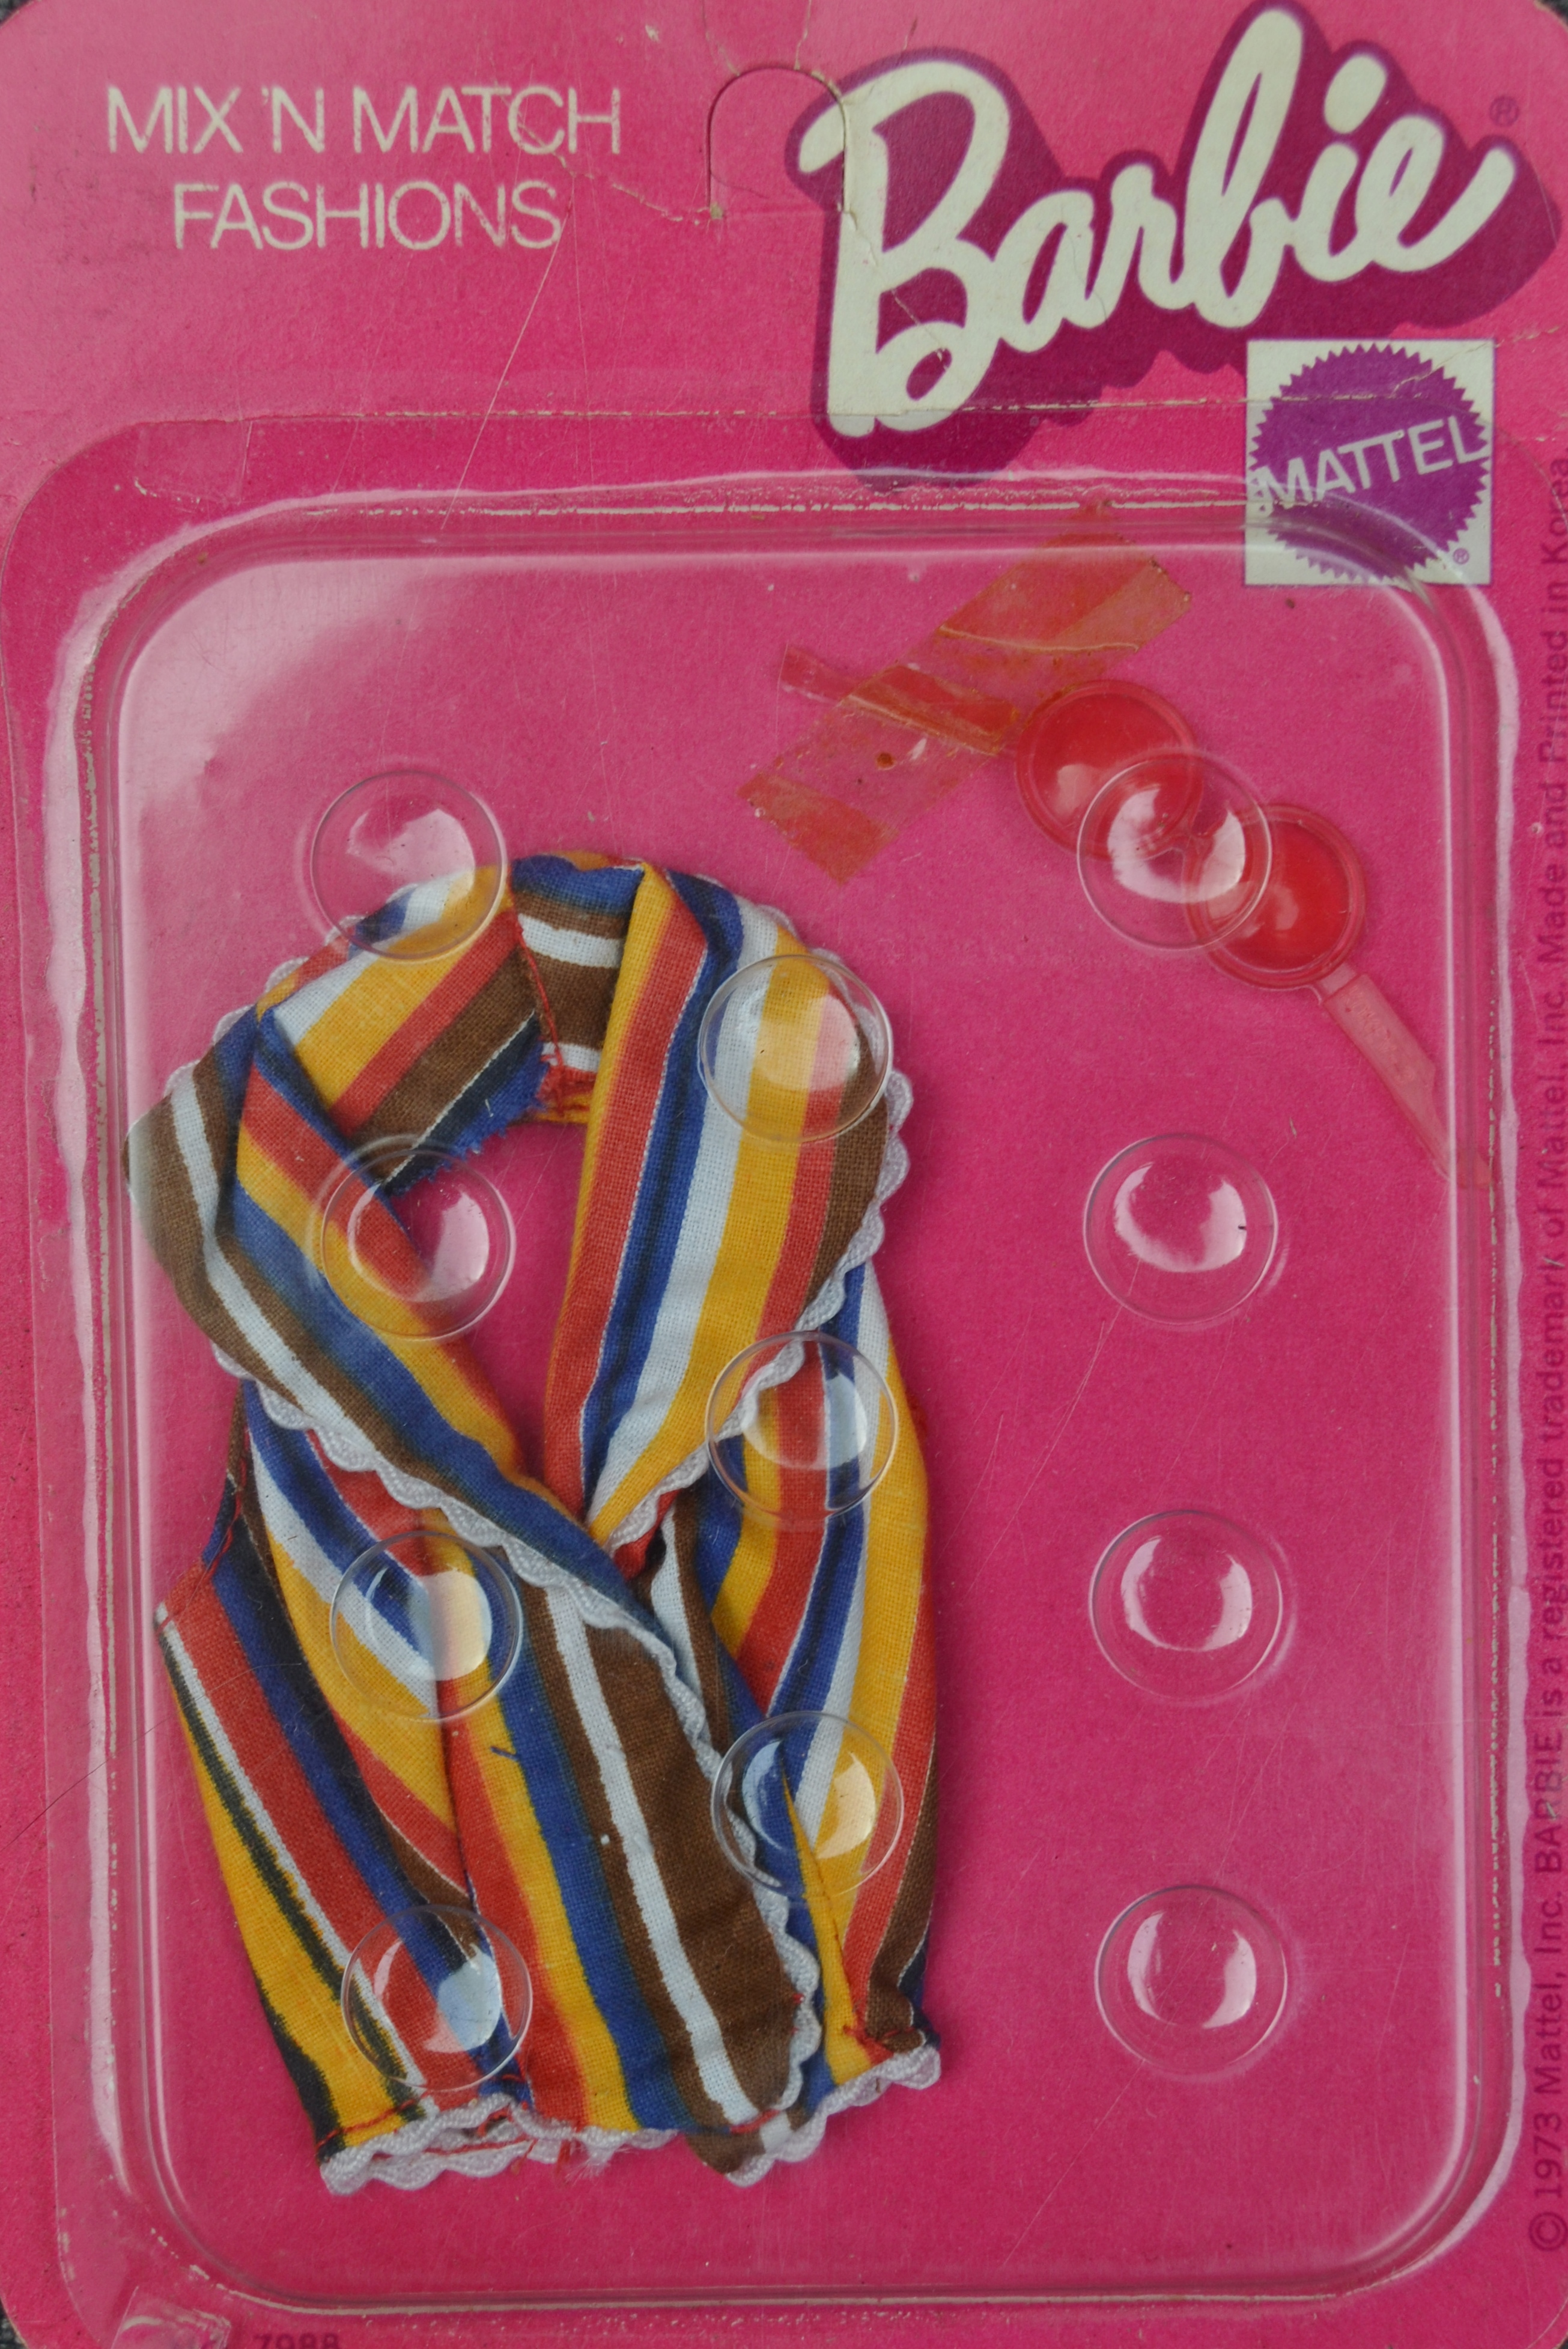 Mix n match clothing store stonecrest